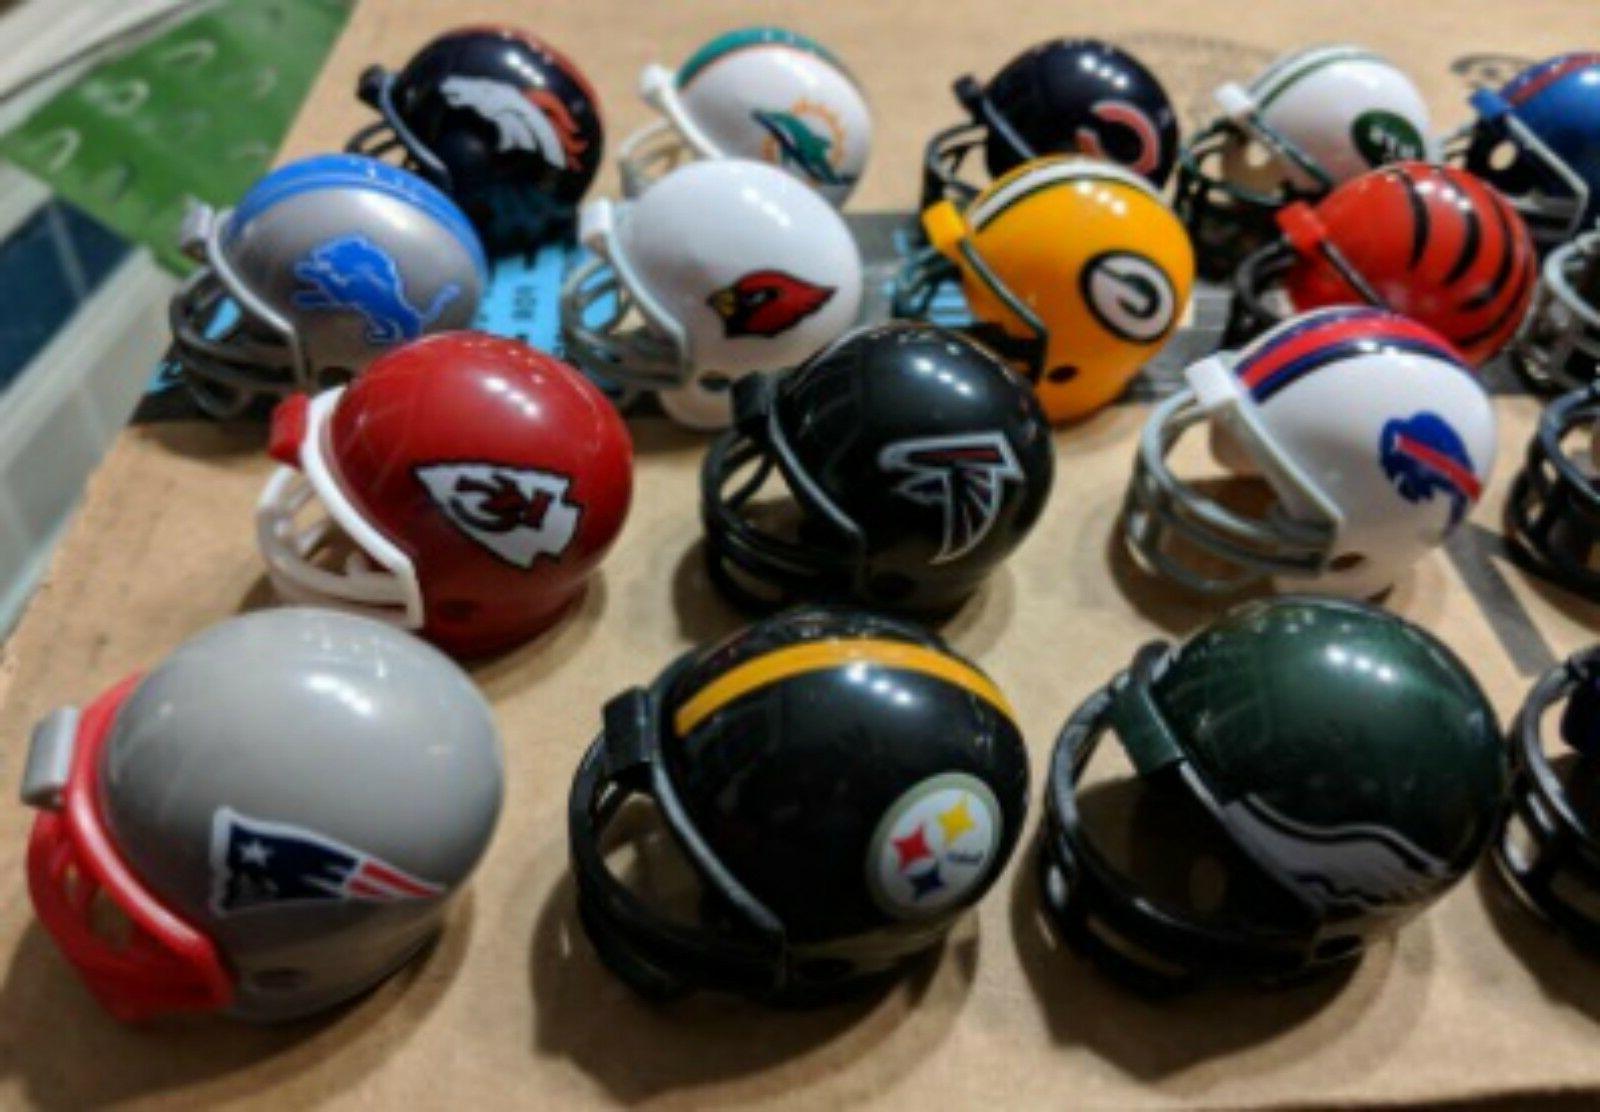 NFL Football Helmet, AFC Bowl NFC And Tracker